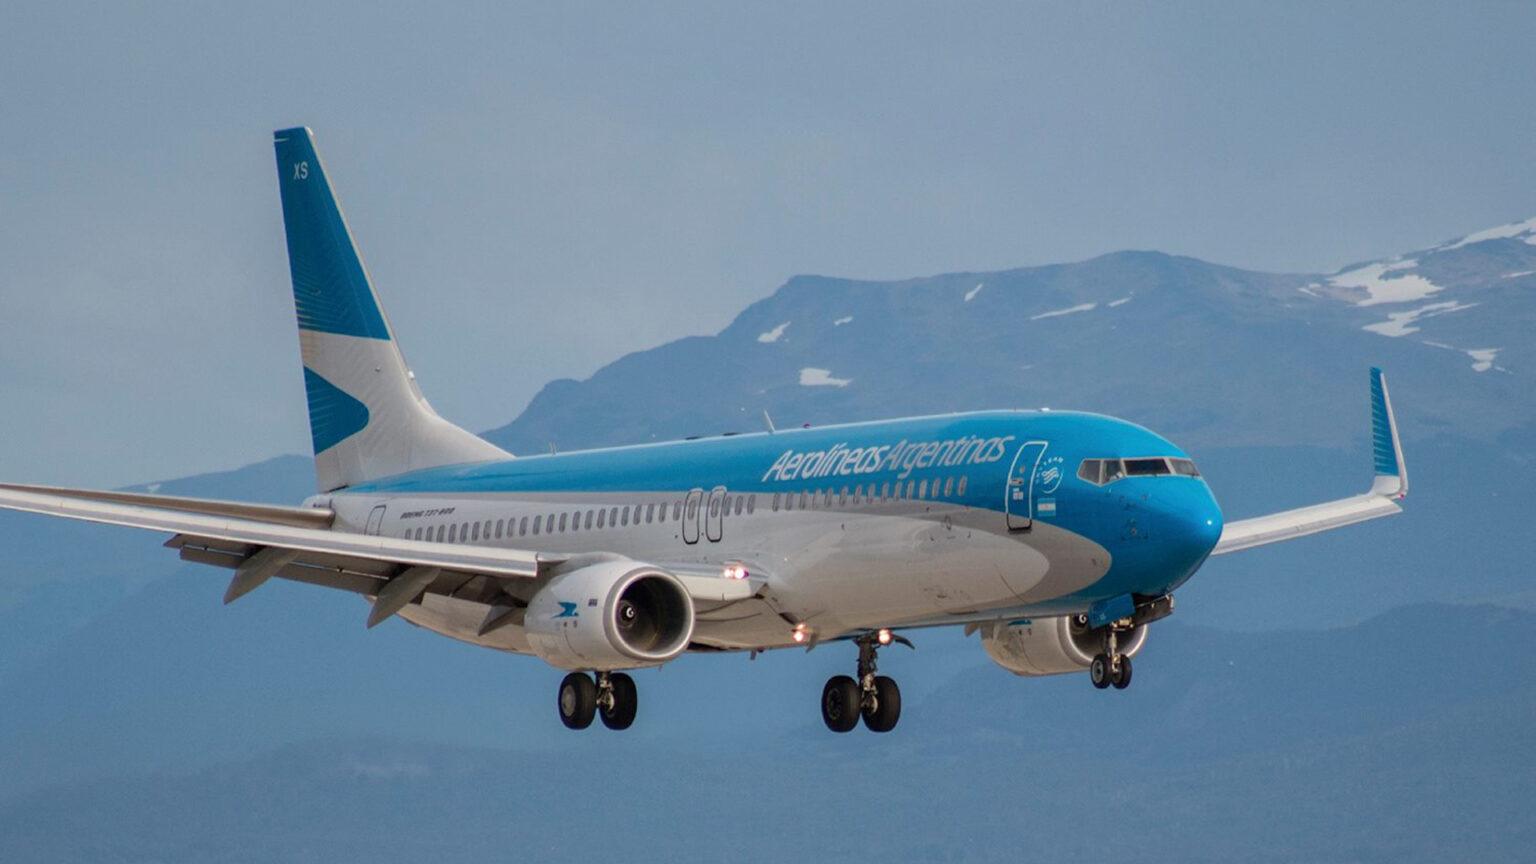 aerolineas-argentinas2-1536x864